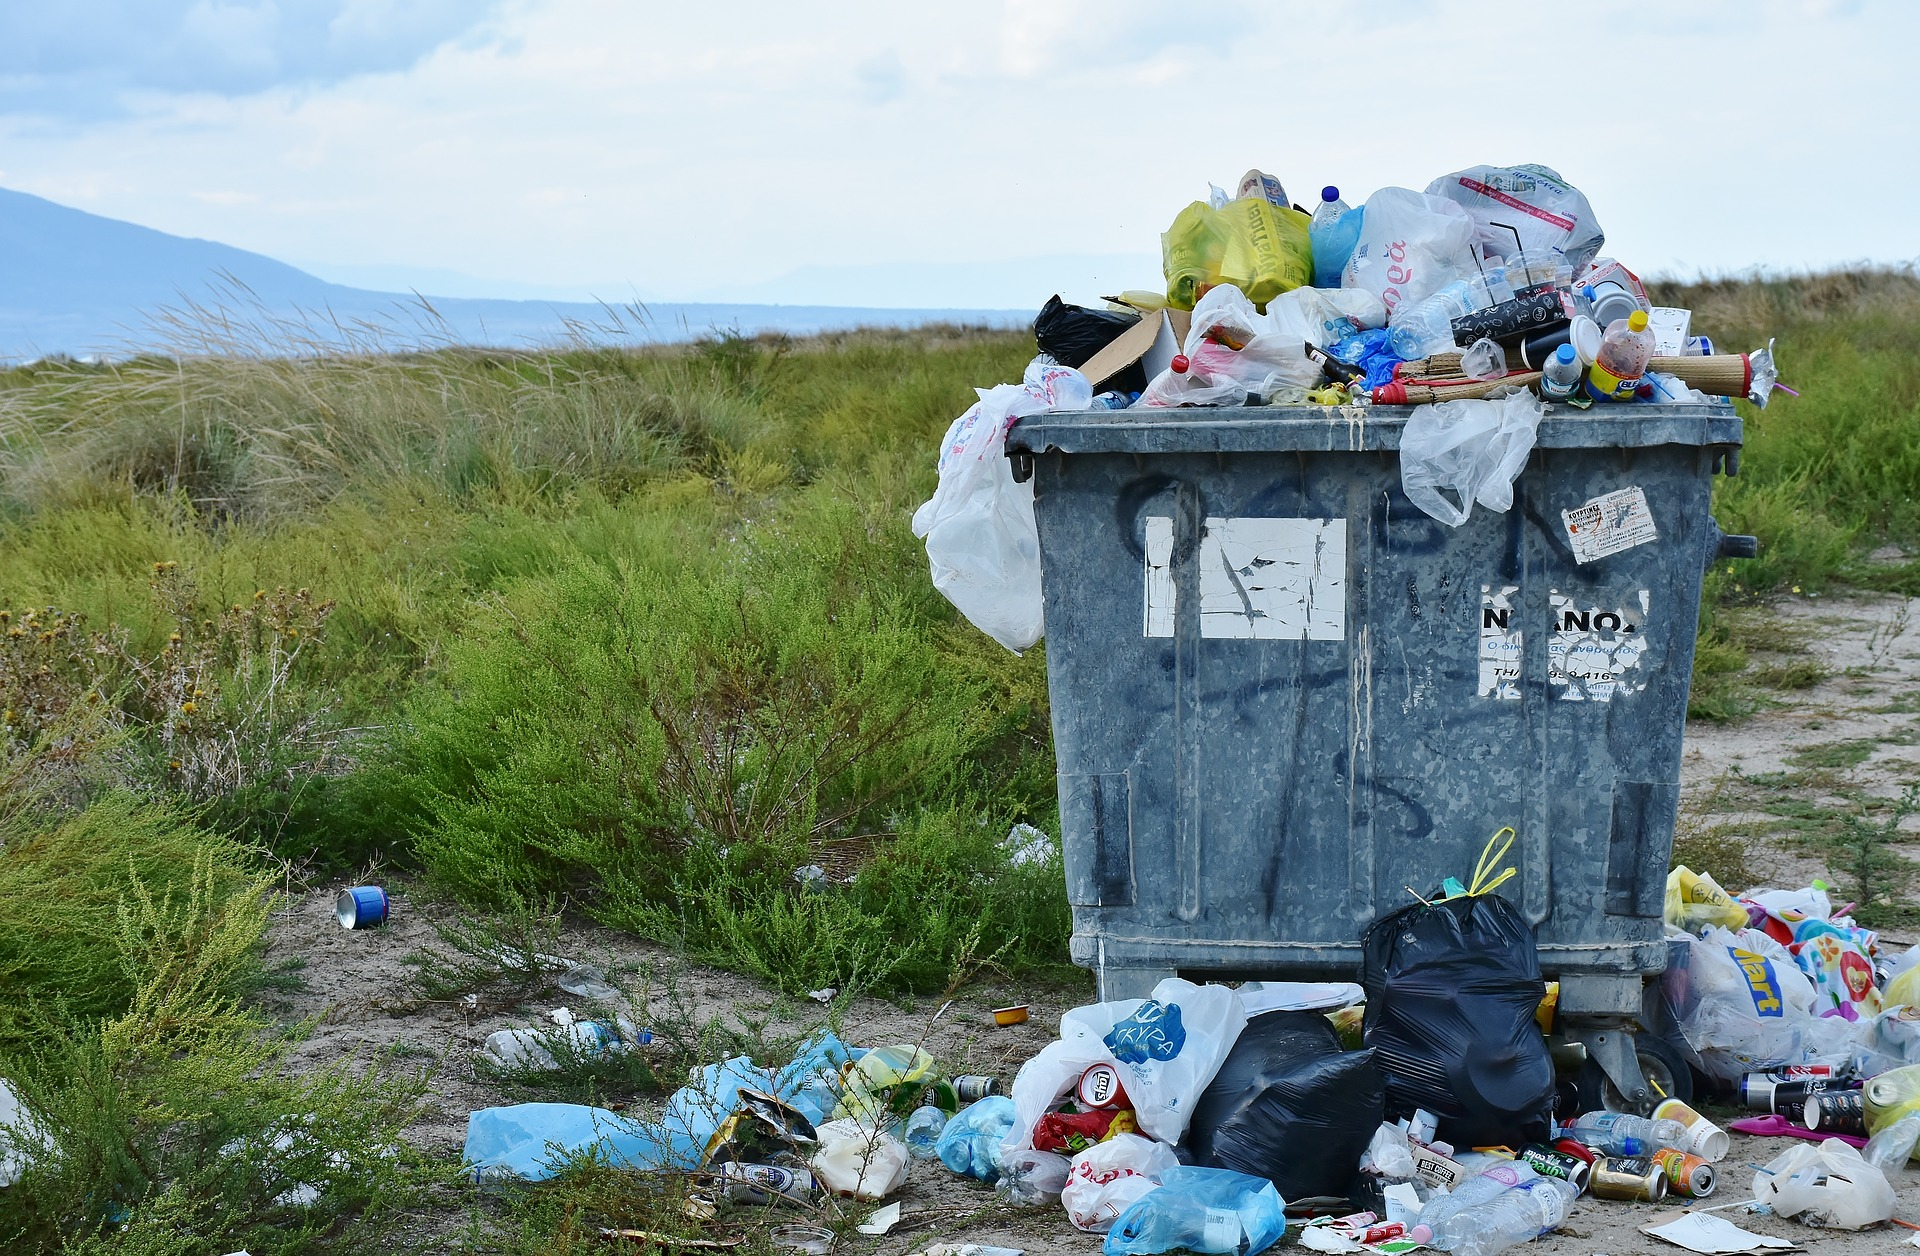 2) Waste - Although